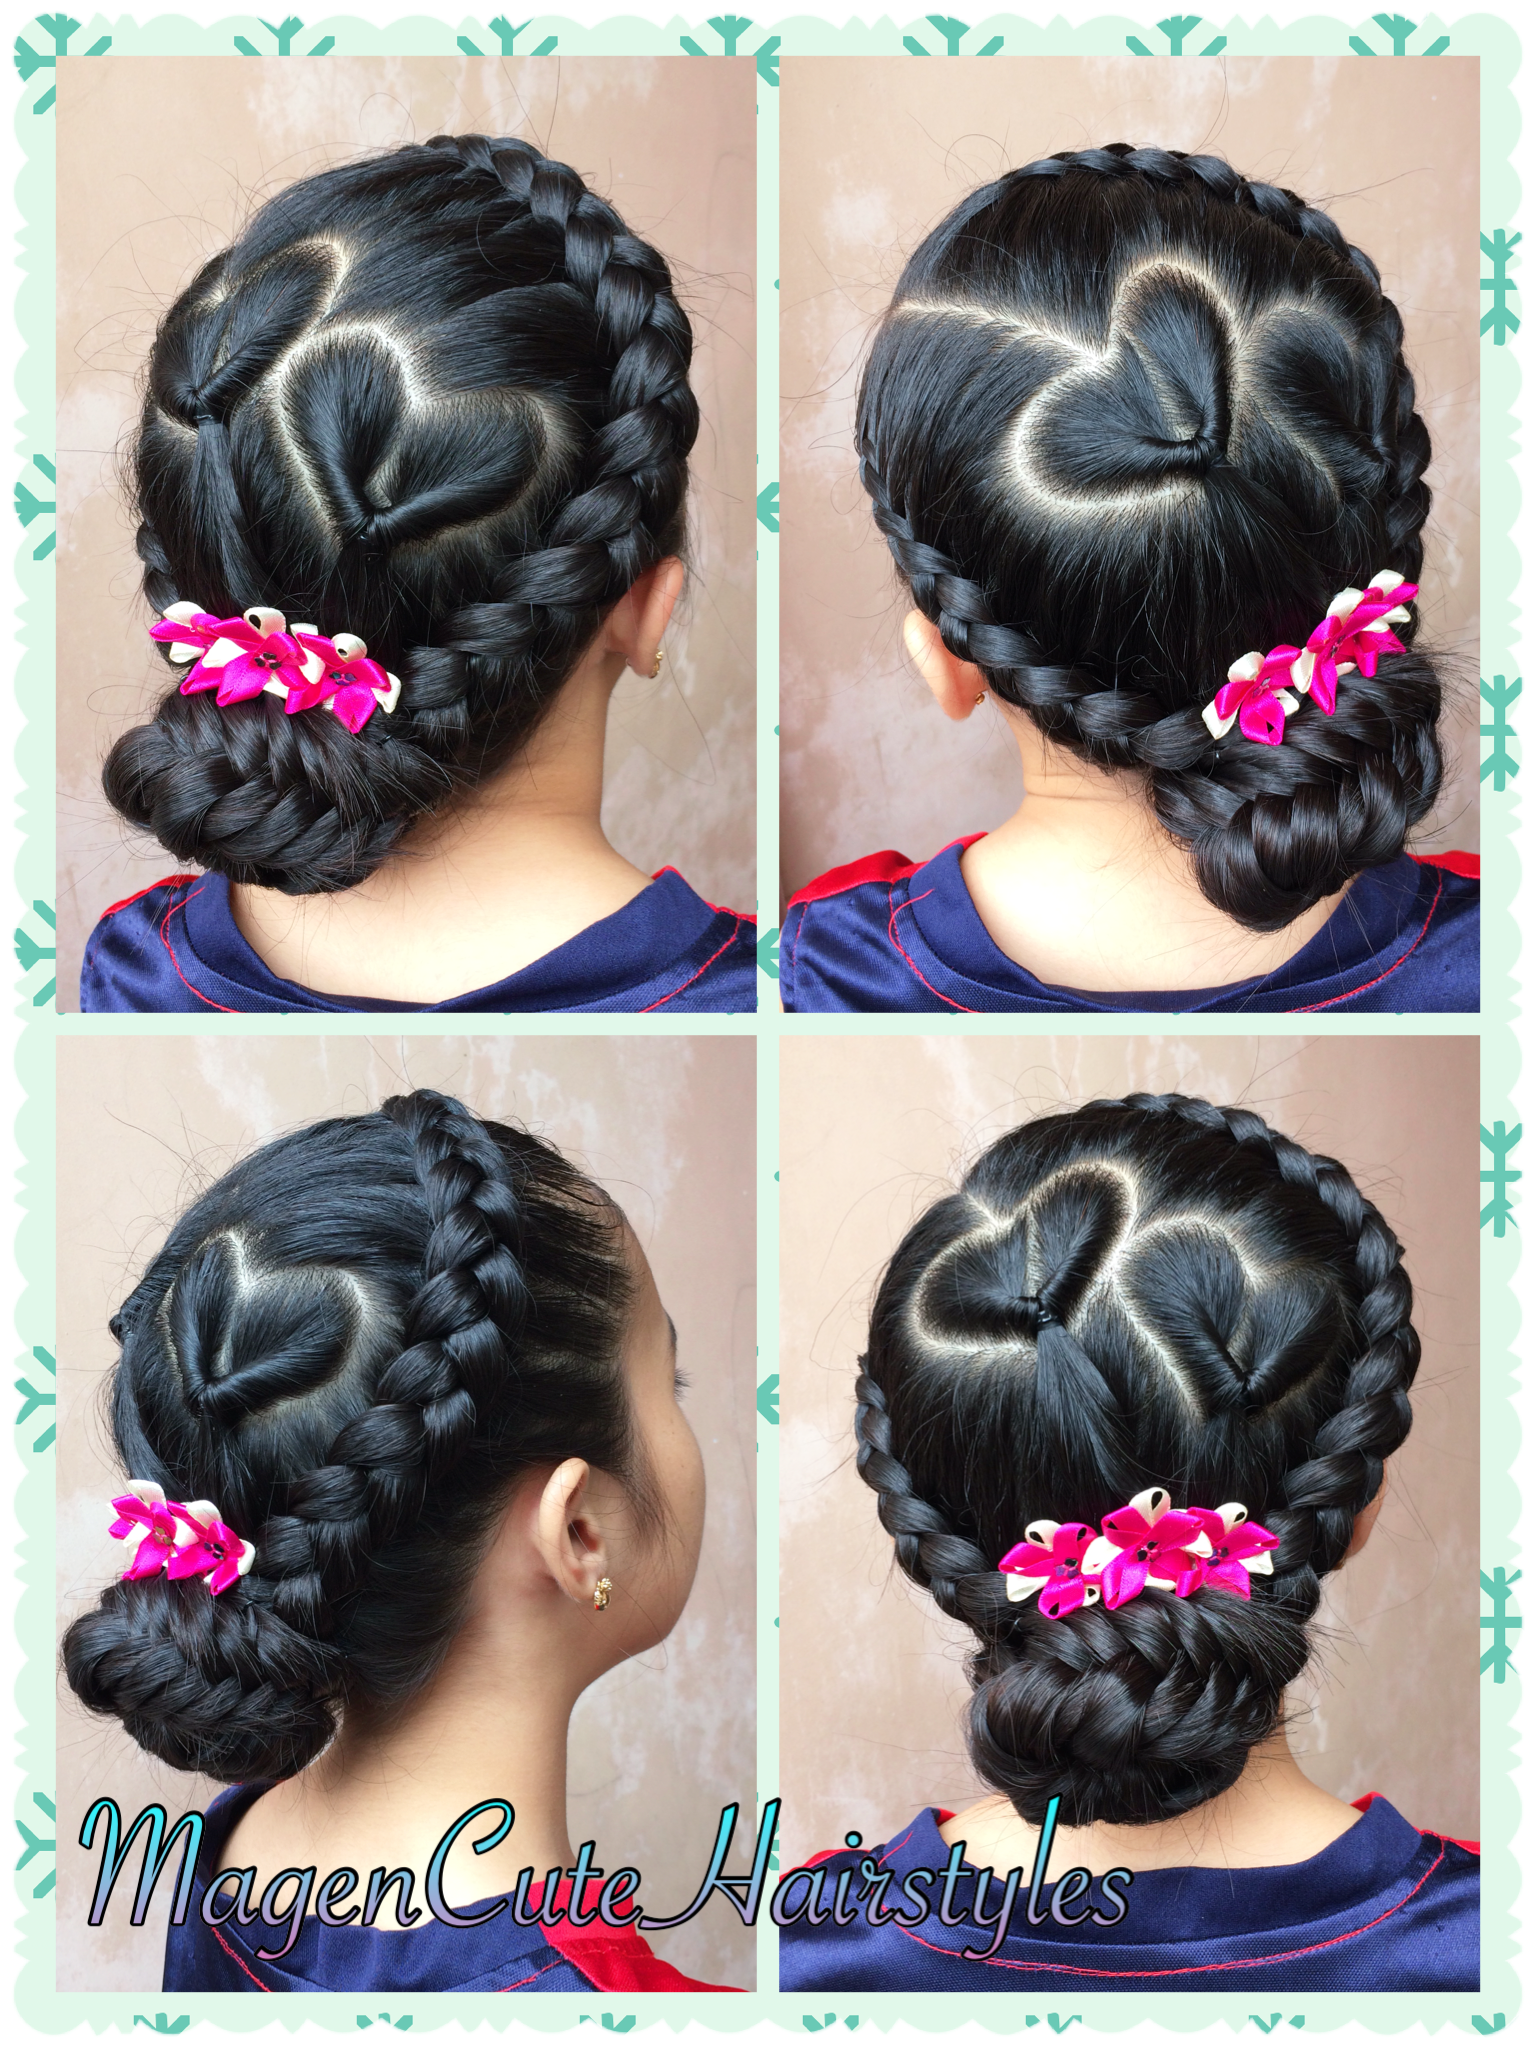 Heart Shape Pull Through With Dutch Braid Updo Braided Hairstyles Hair Dos For Kids Toddler Hair